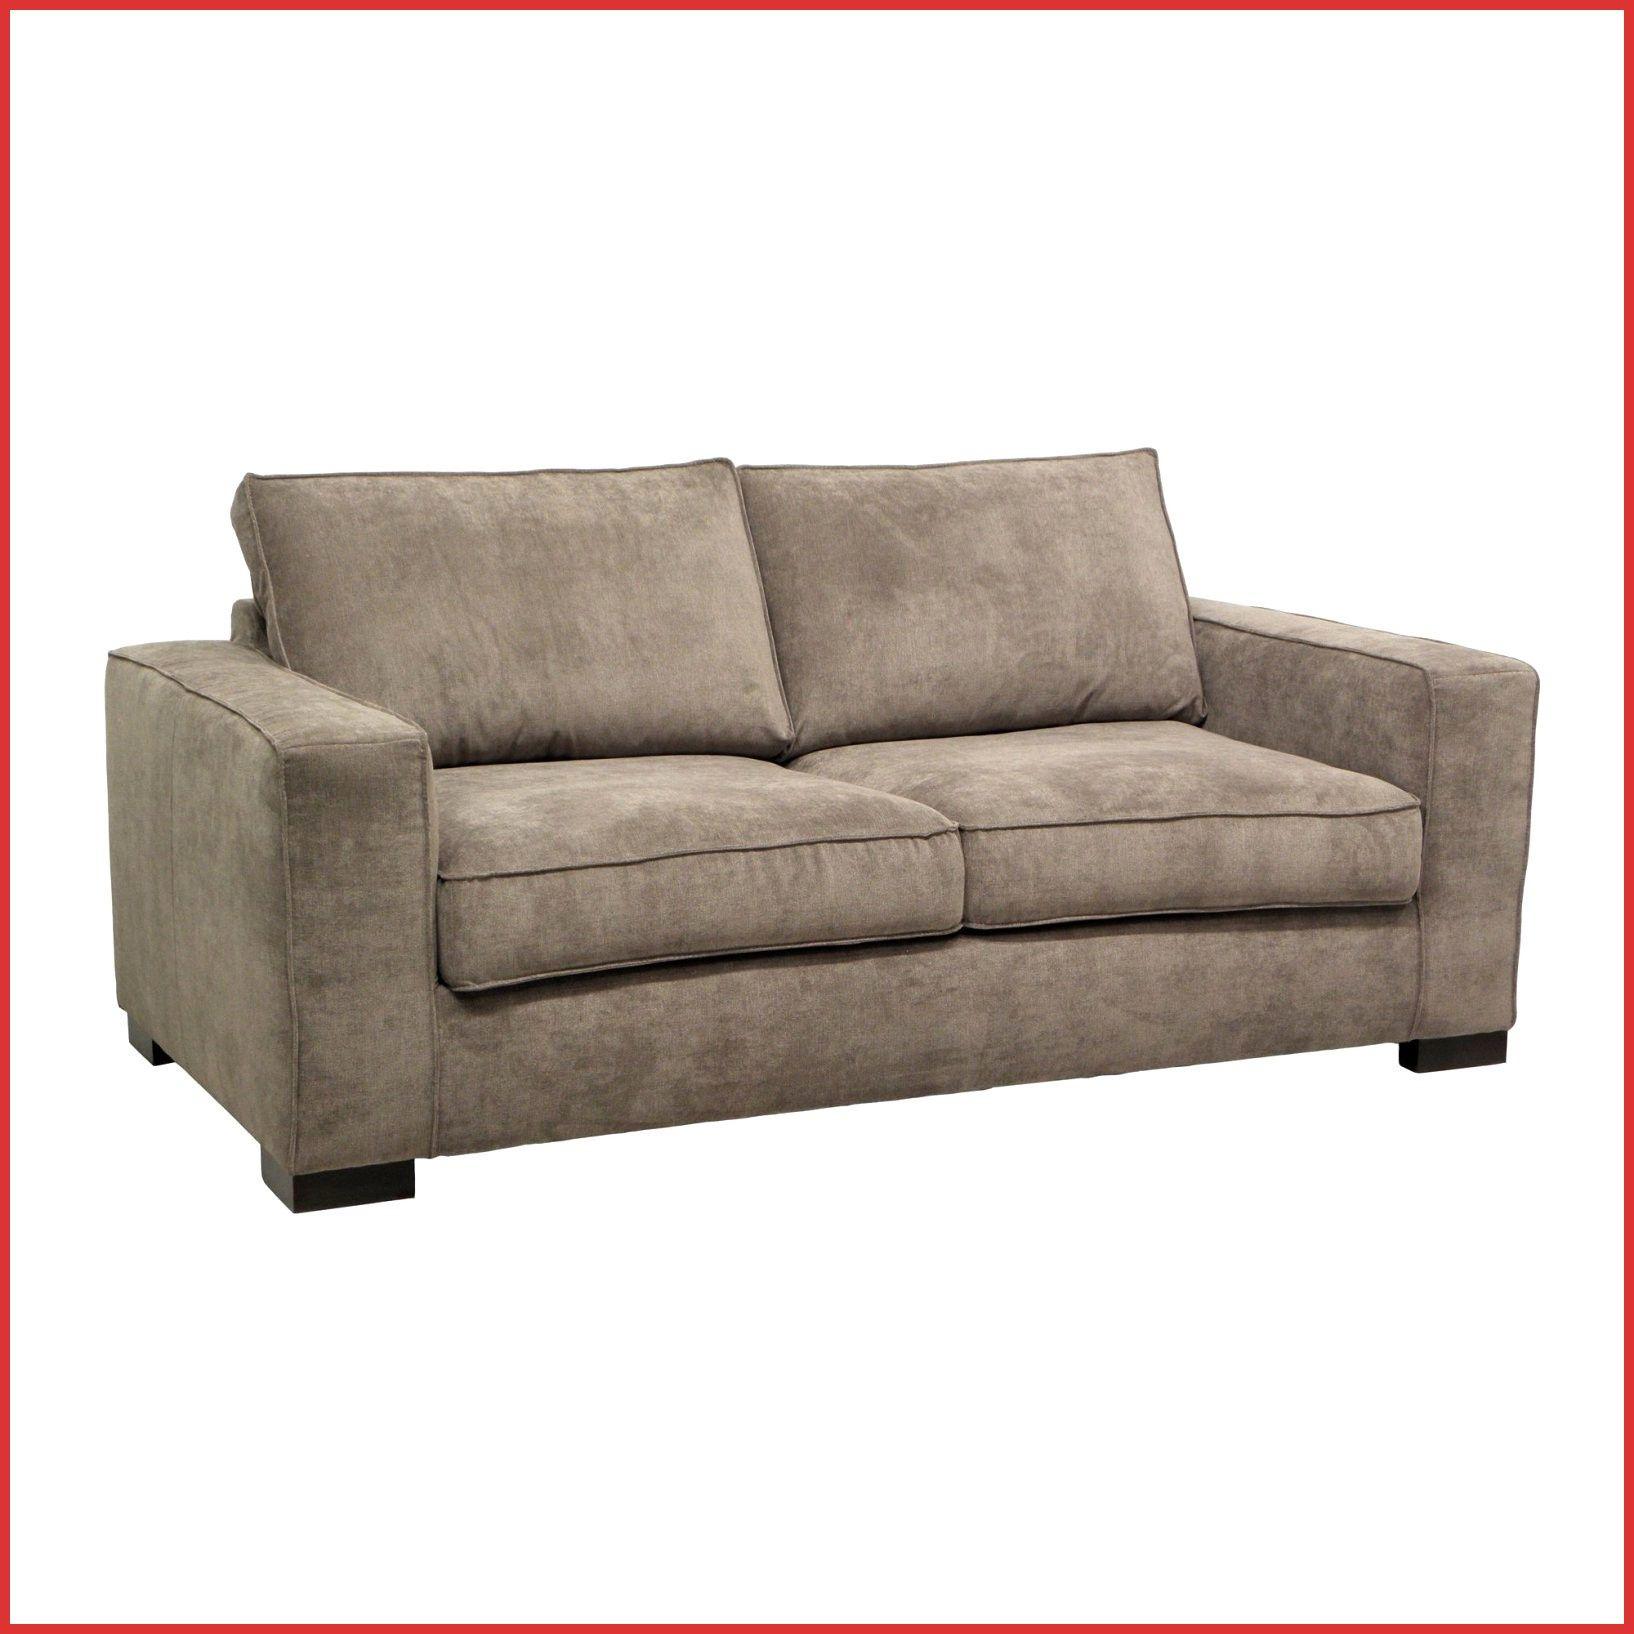 16 Animé Conforama Canapé 2 Places Image | Outdoor Sofa ... pour Chauffeuse 2 Places Conforama